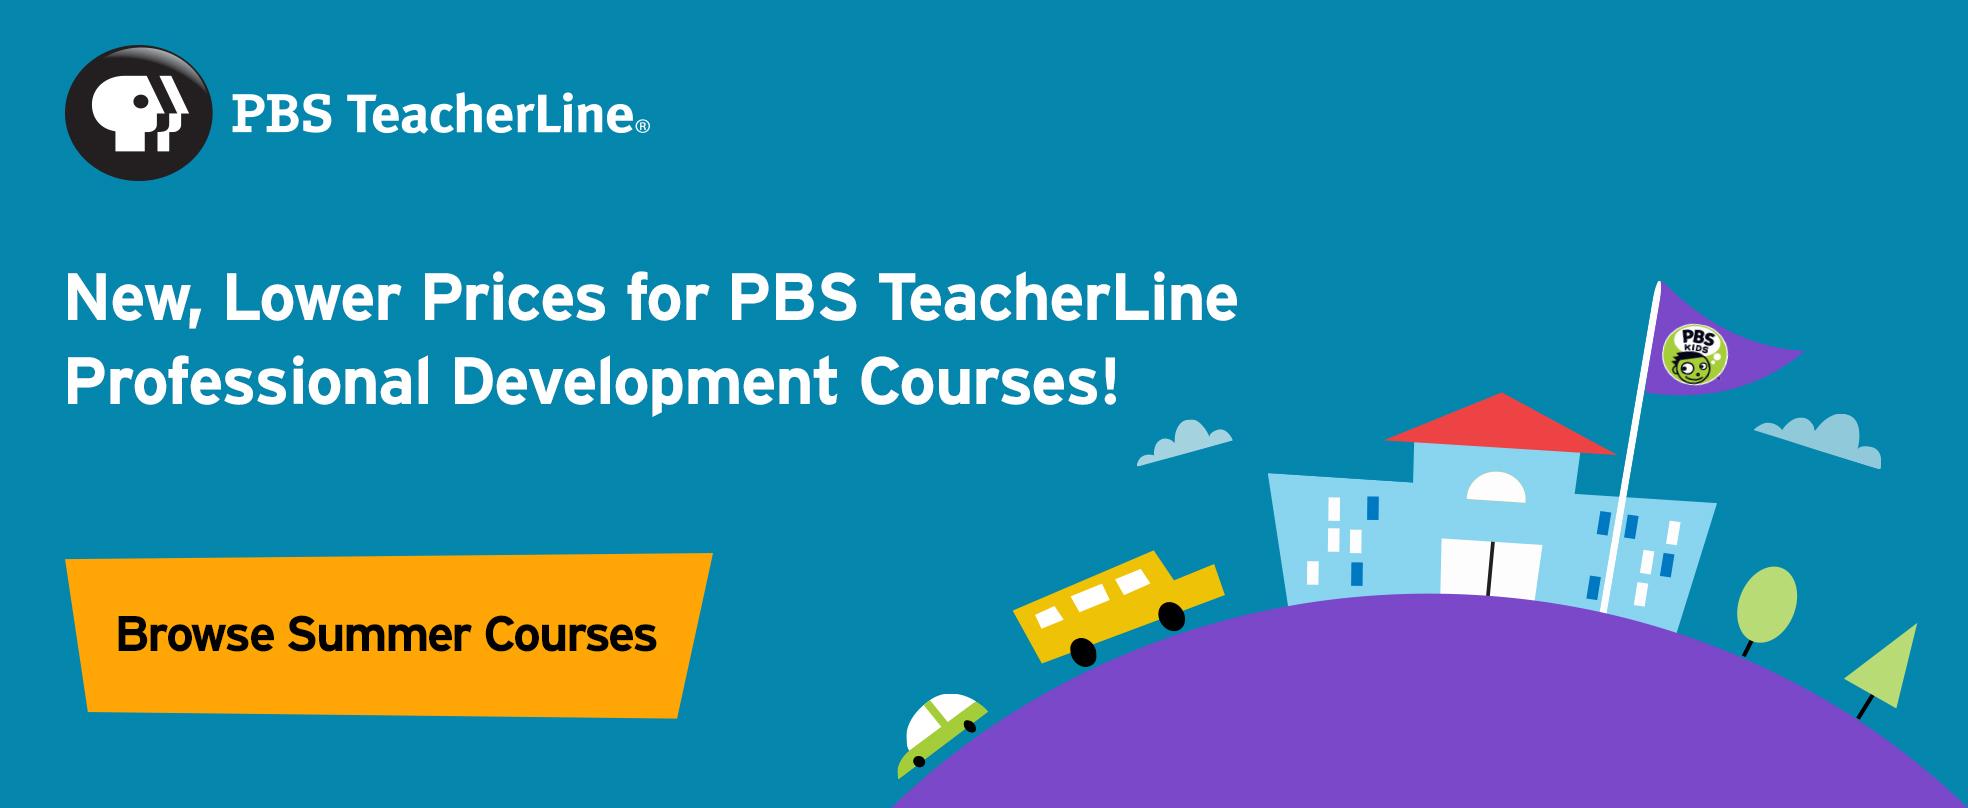 Explore Summer courses open for enrollment now!